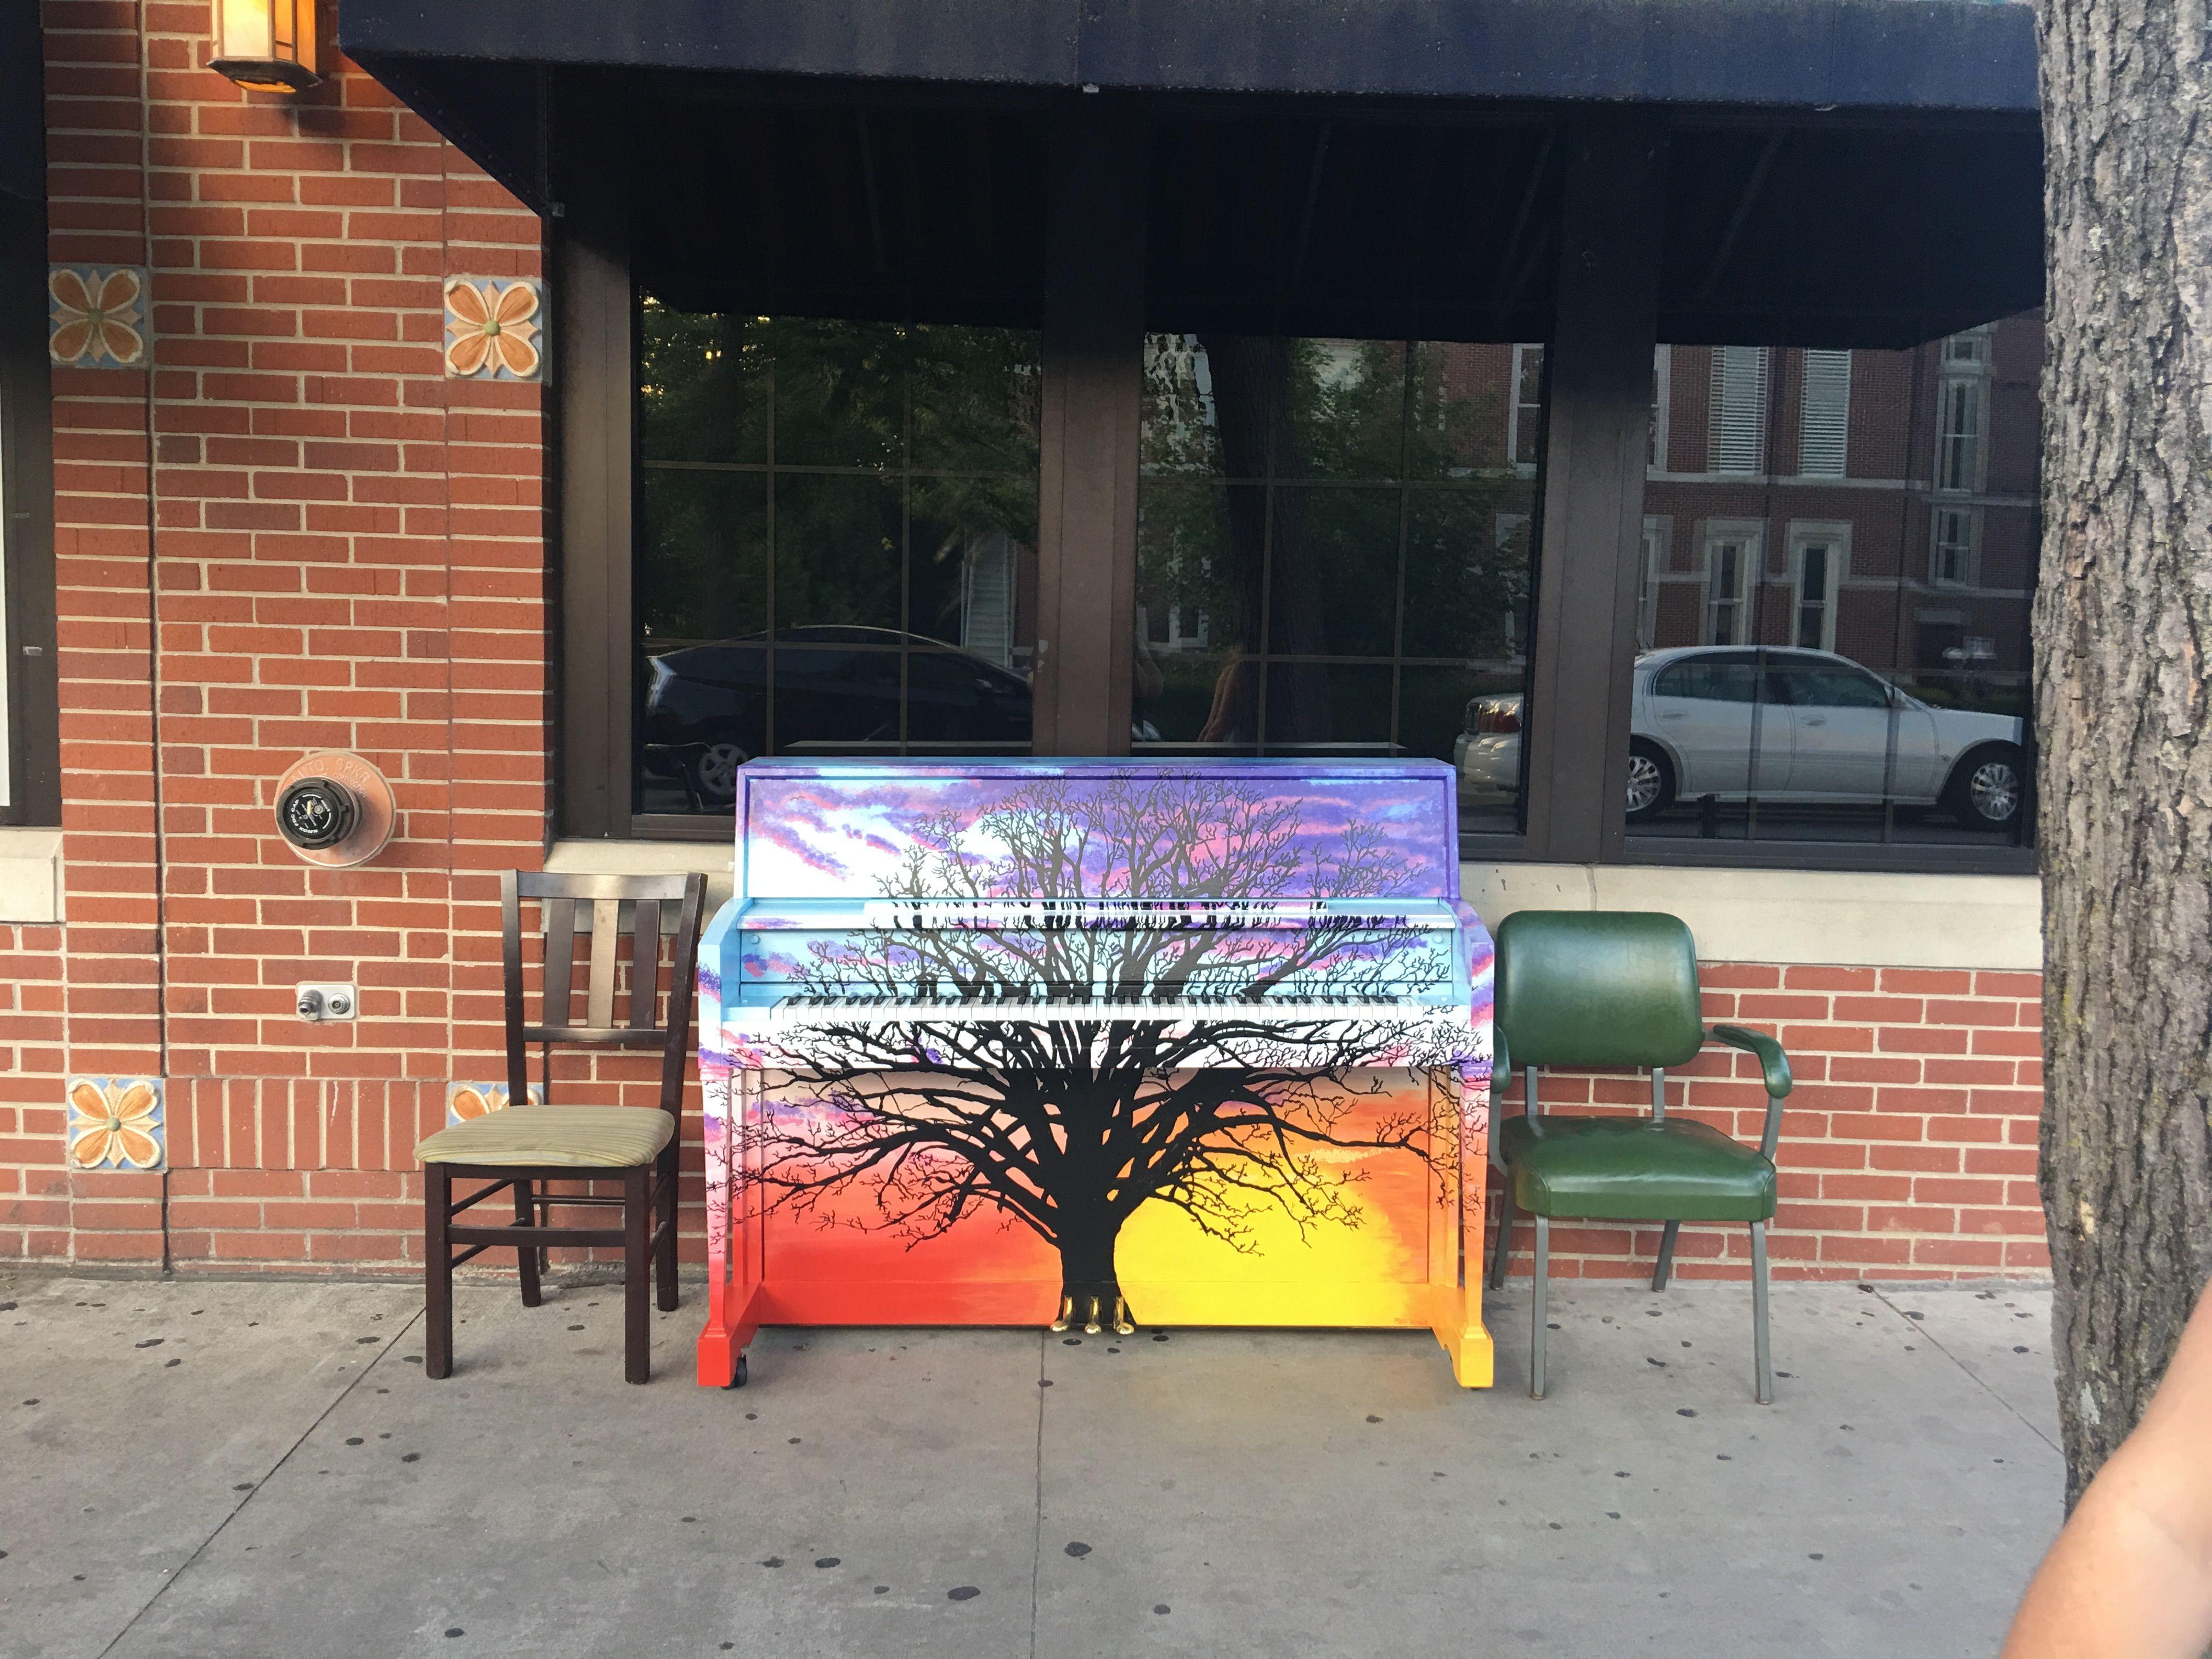 Pin by Rob Behne on Street Piano Big Tree Big tree